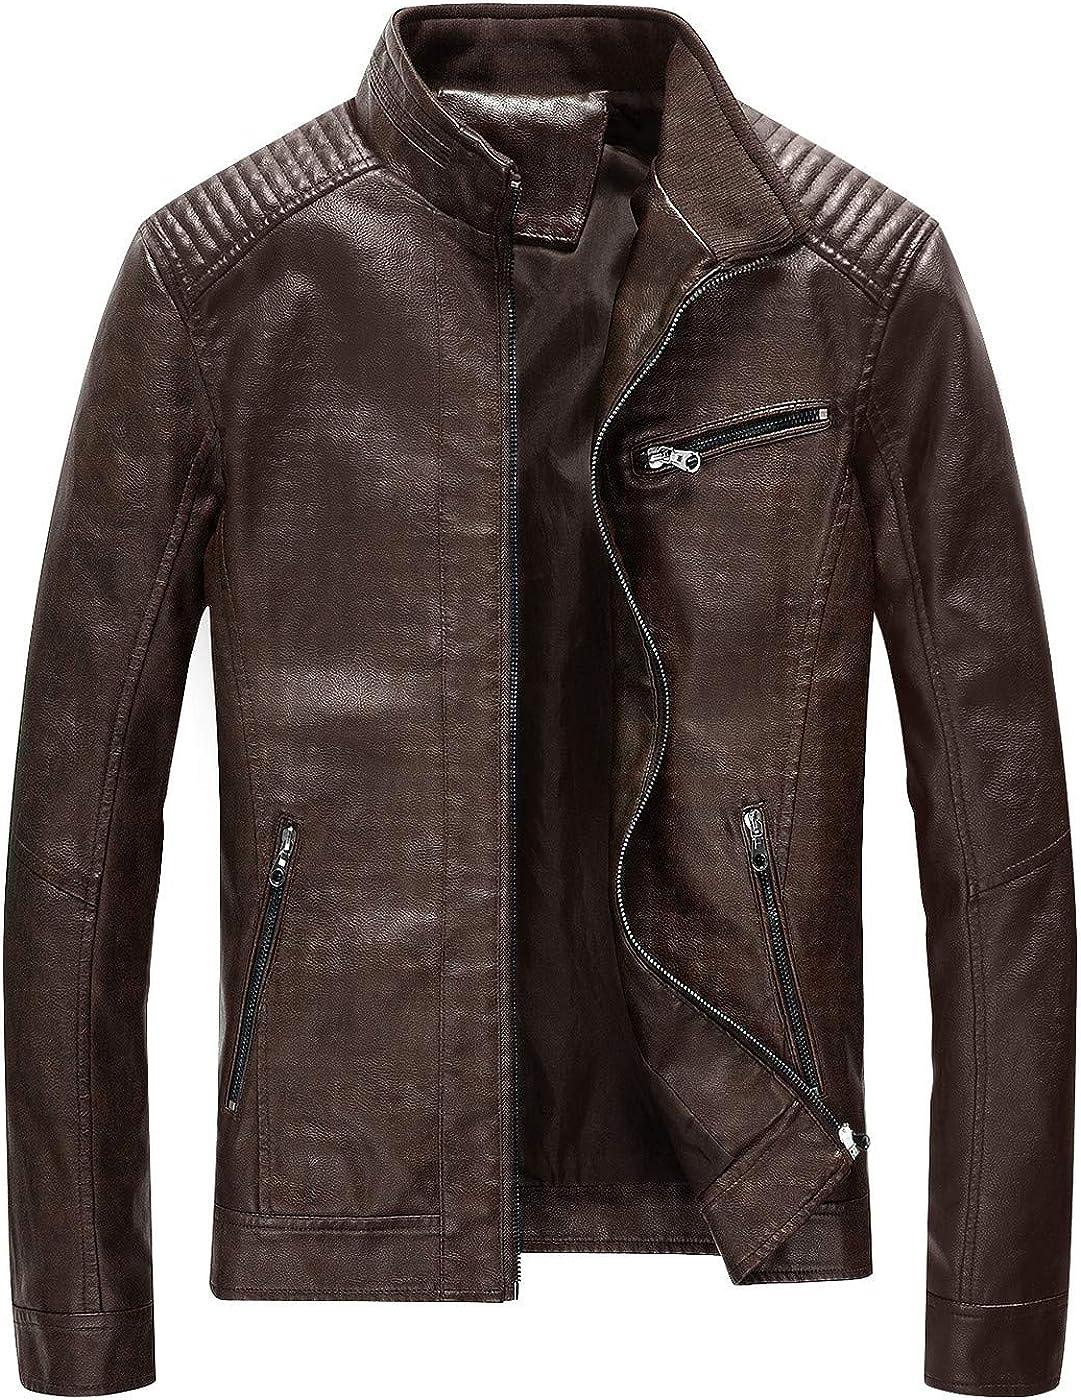 Fairylinks Leather Jacket Men Black Slim Fit Motorcyle Lightweight